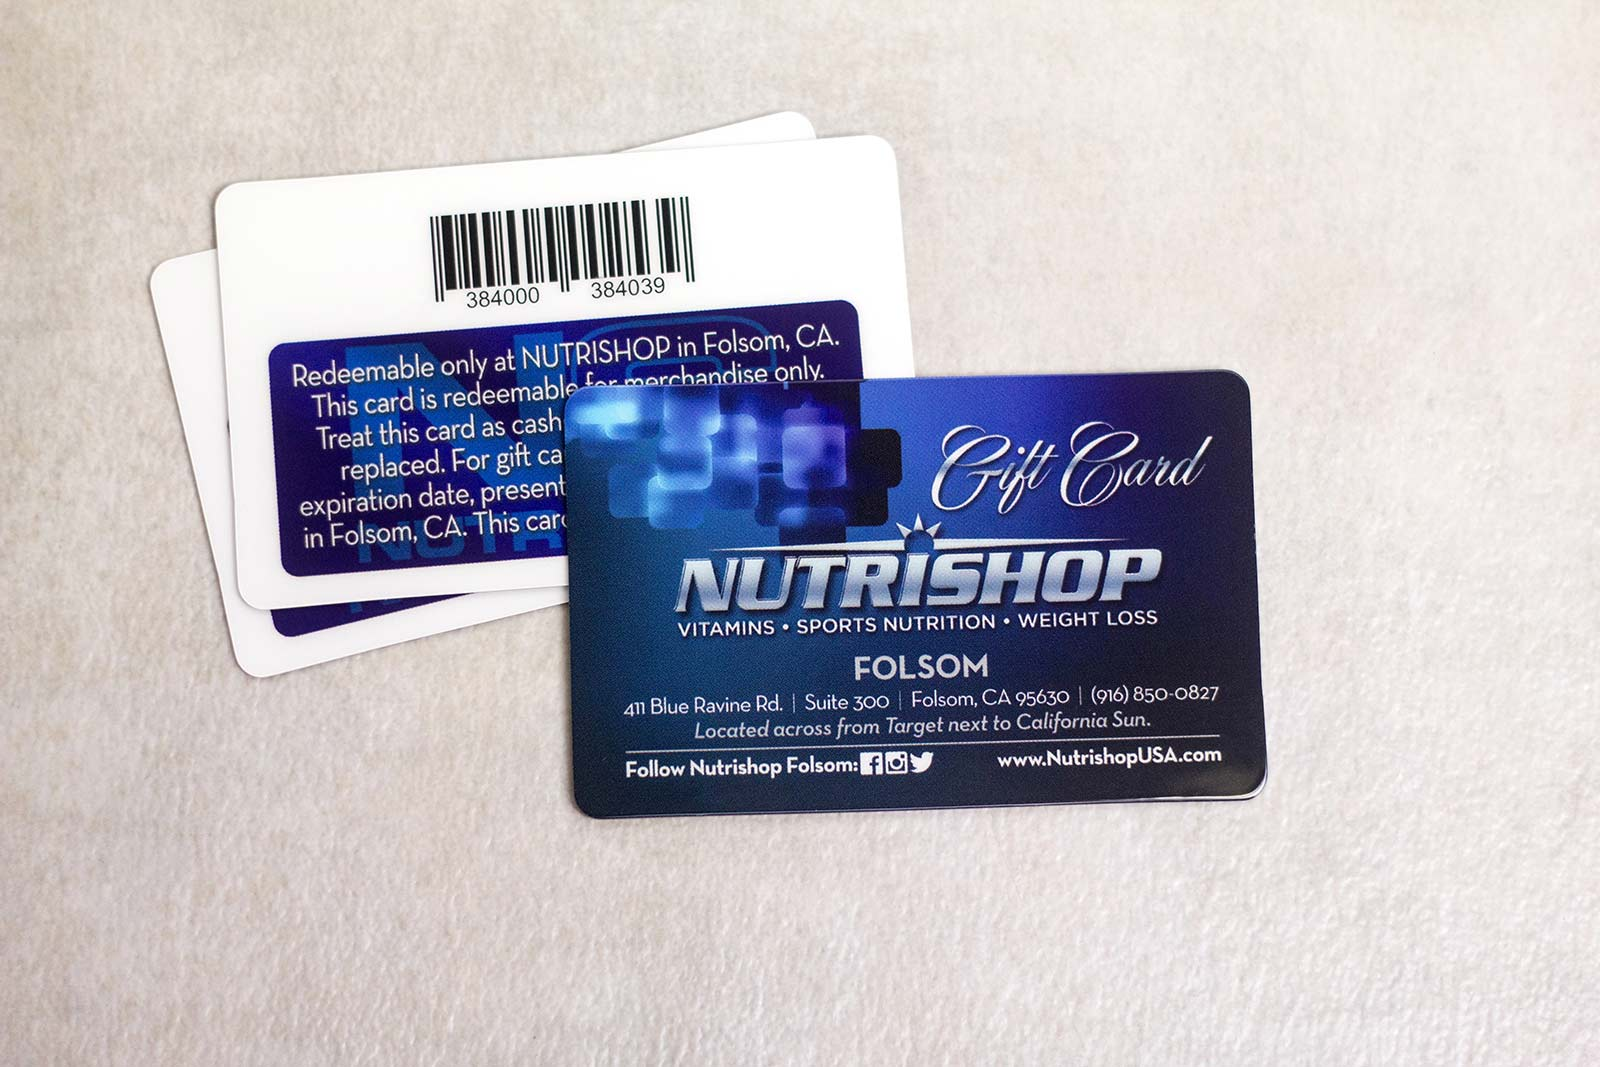 Small business gift cards arts arts small business gift cards custom gift cards for infuse it plastic printers colourmoves